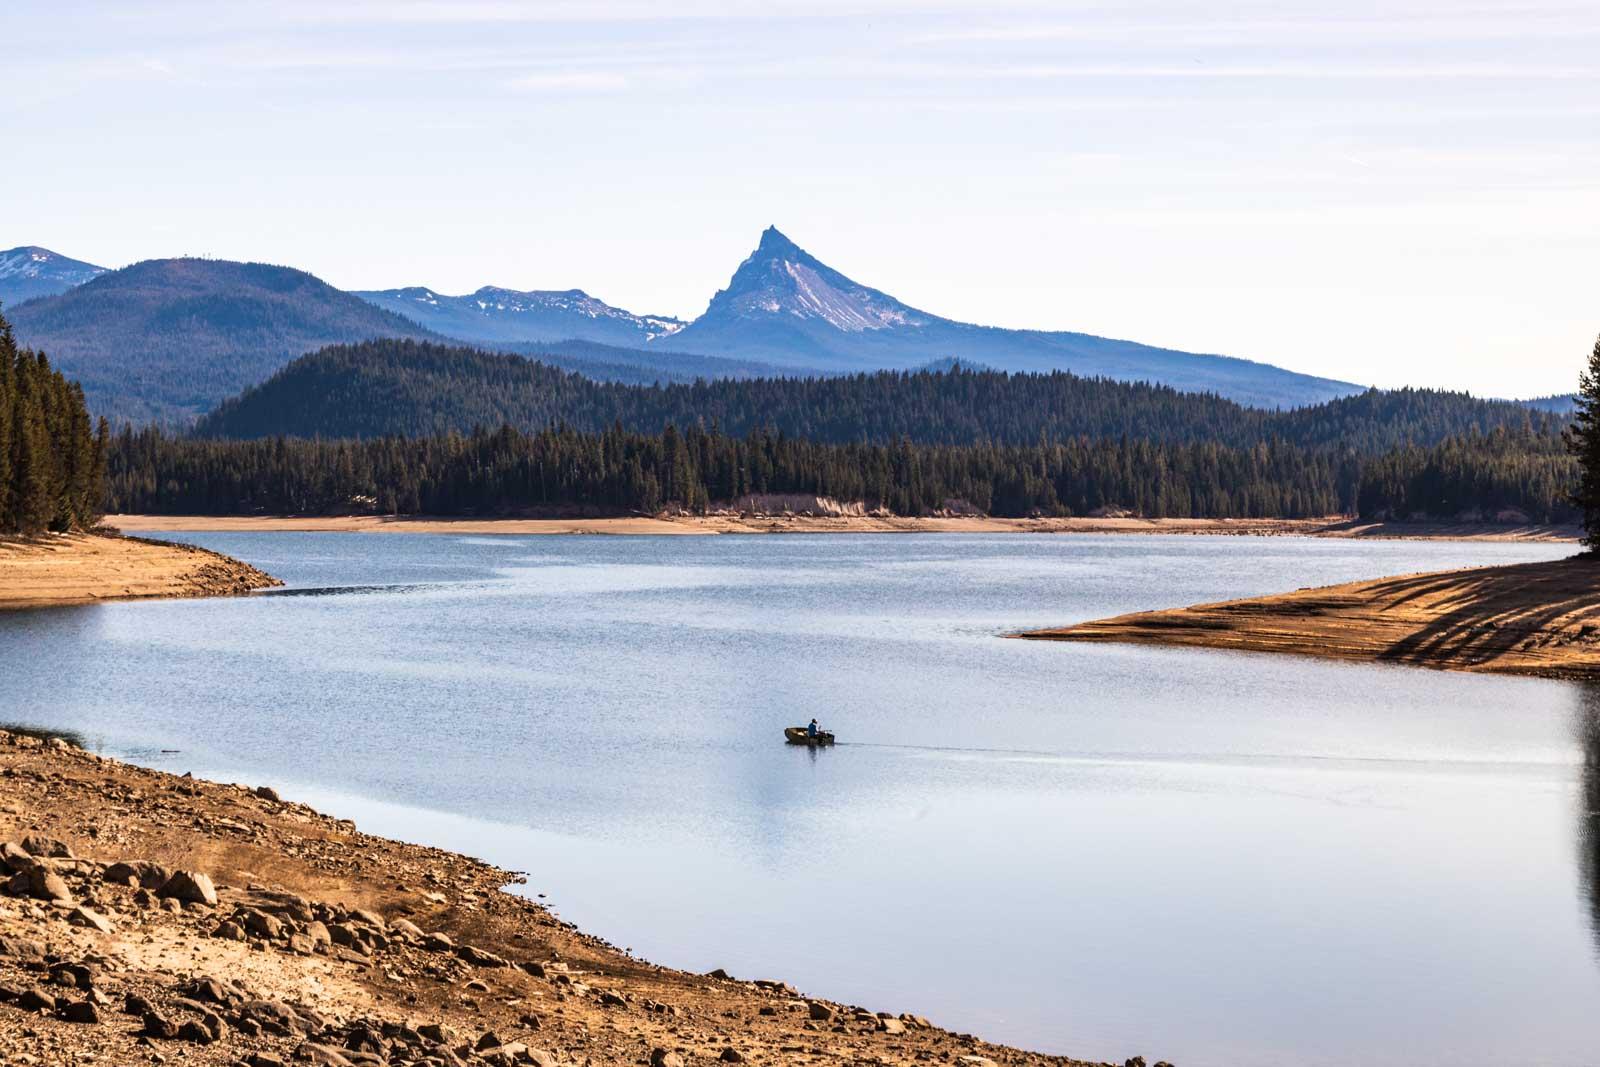 The beauty of Lemolo Lake in Umpqua National Forest